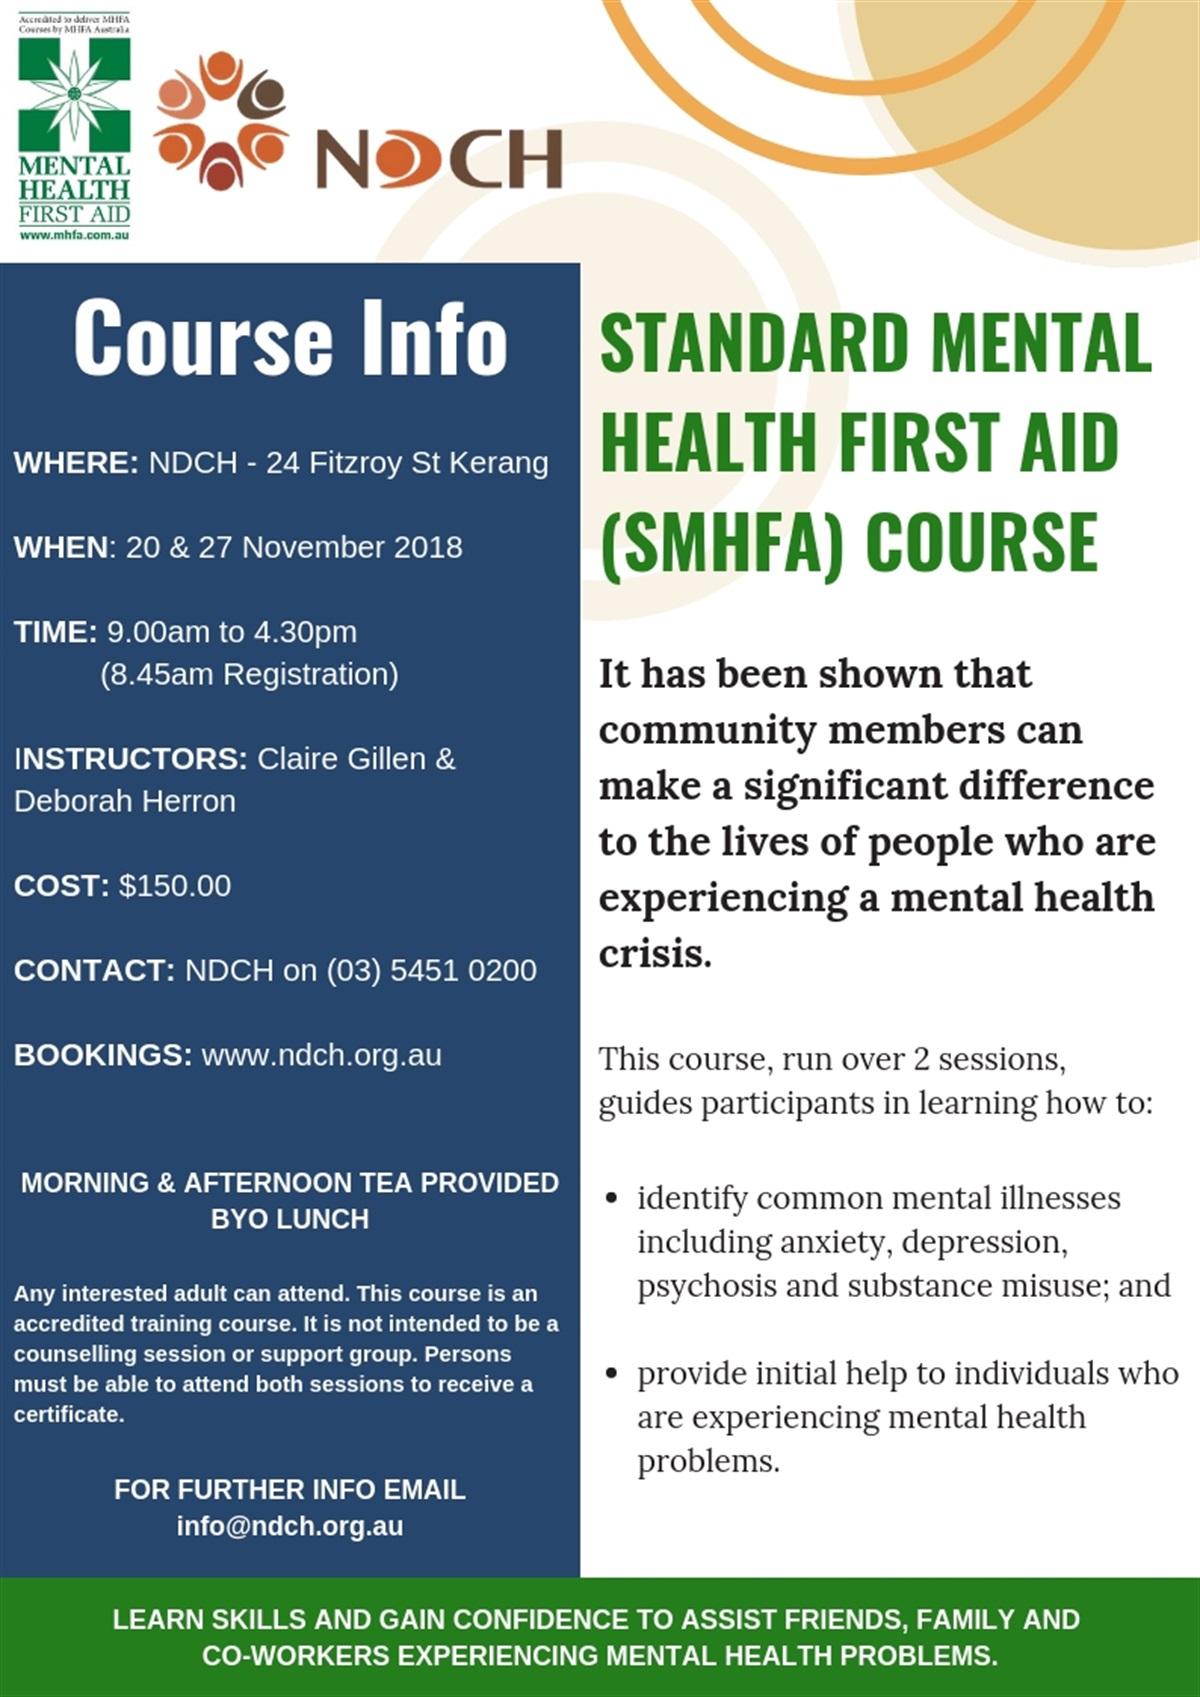 Standard Mental Health First Aid (SMHFA) Course ...